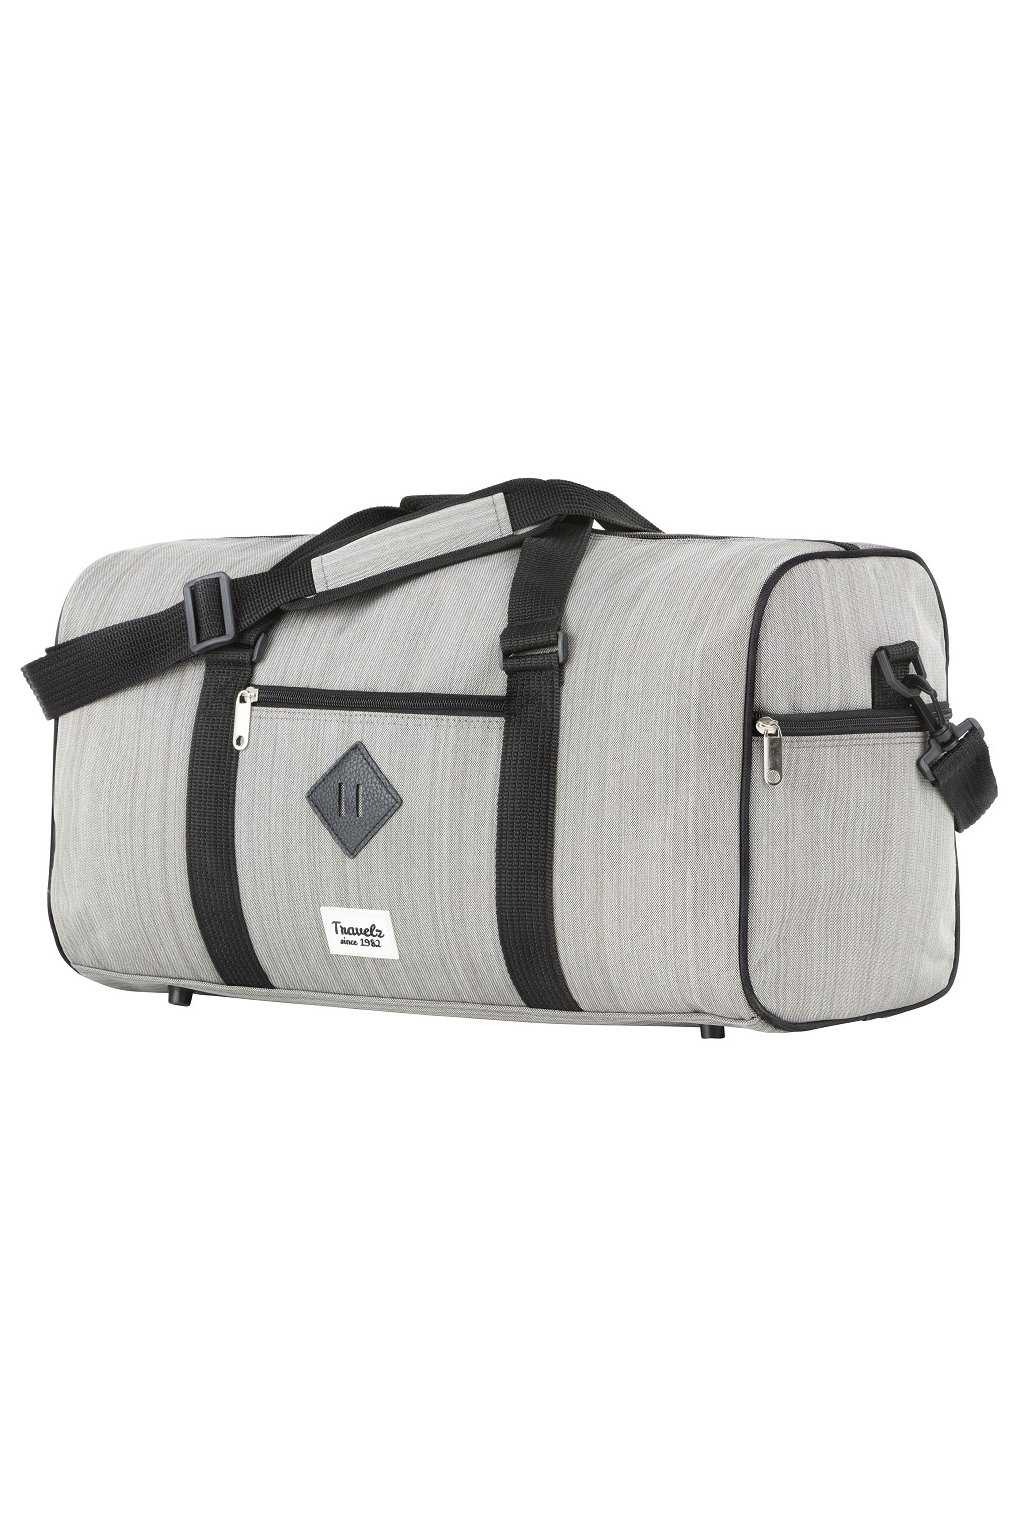 kufrland travelz hipster travelbag 604331 (1)